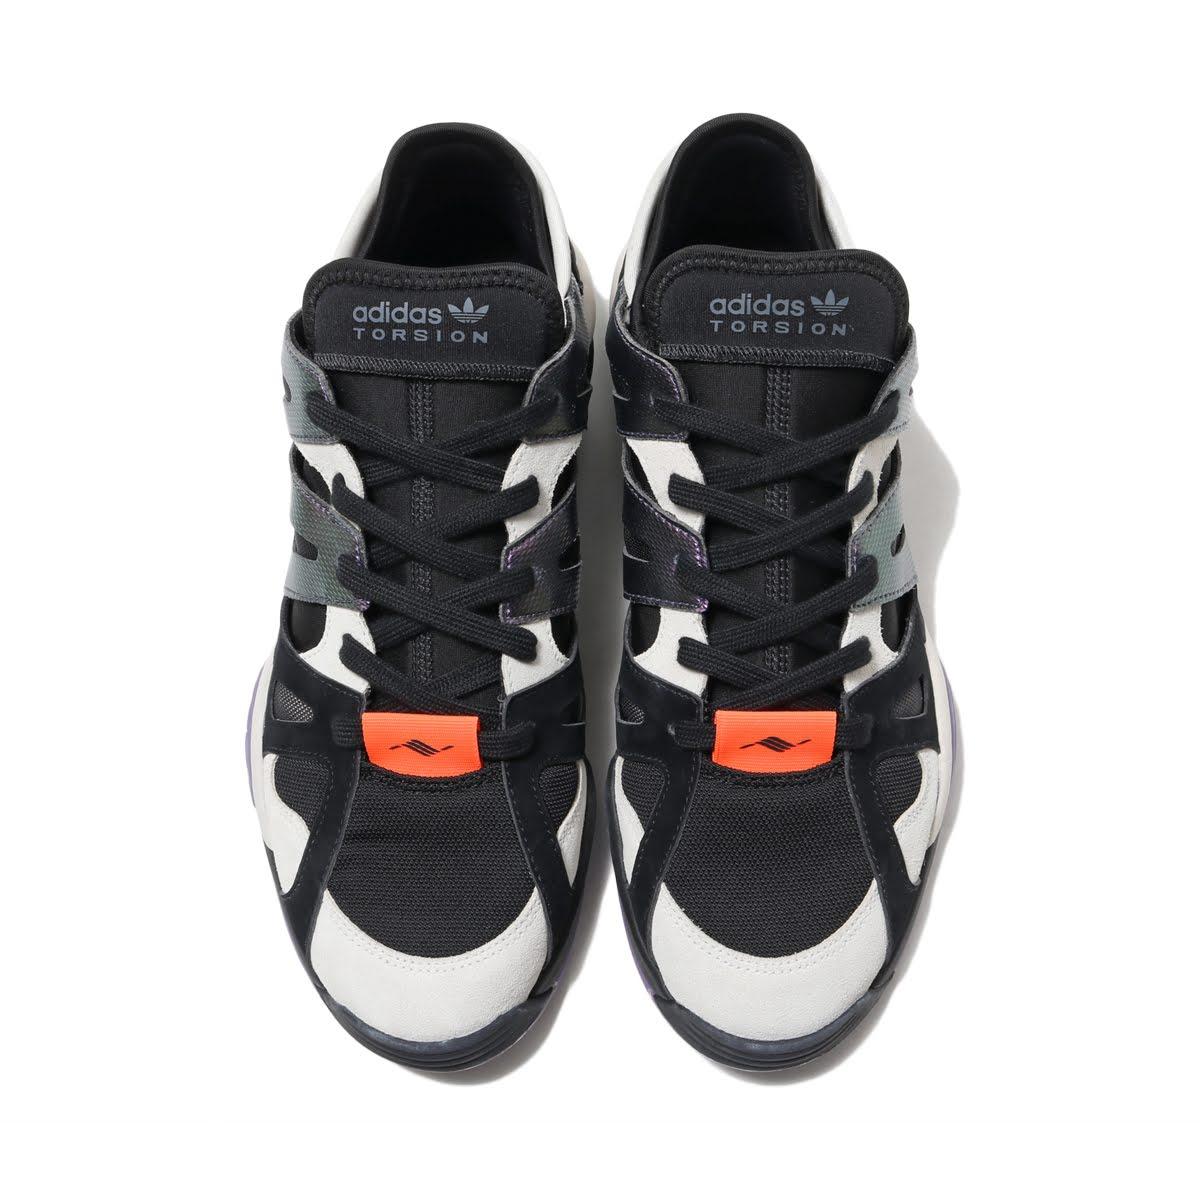 the latest 5aeb4 32a0c adidas Originals DIMENSION LO (CORE BLACKRAW WHITEACTIVE PURPLE) (Adidas  originals dimension low)